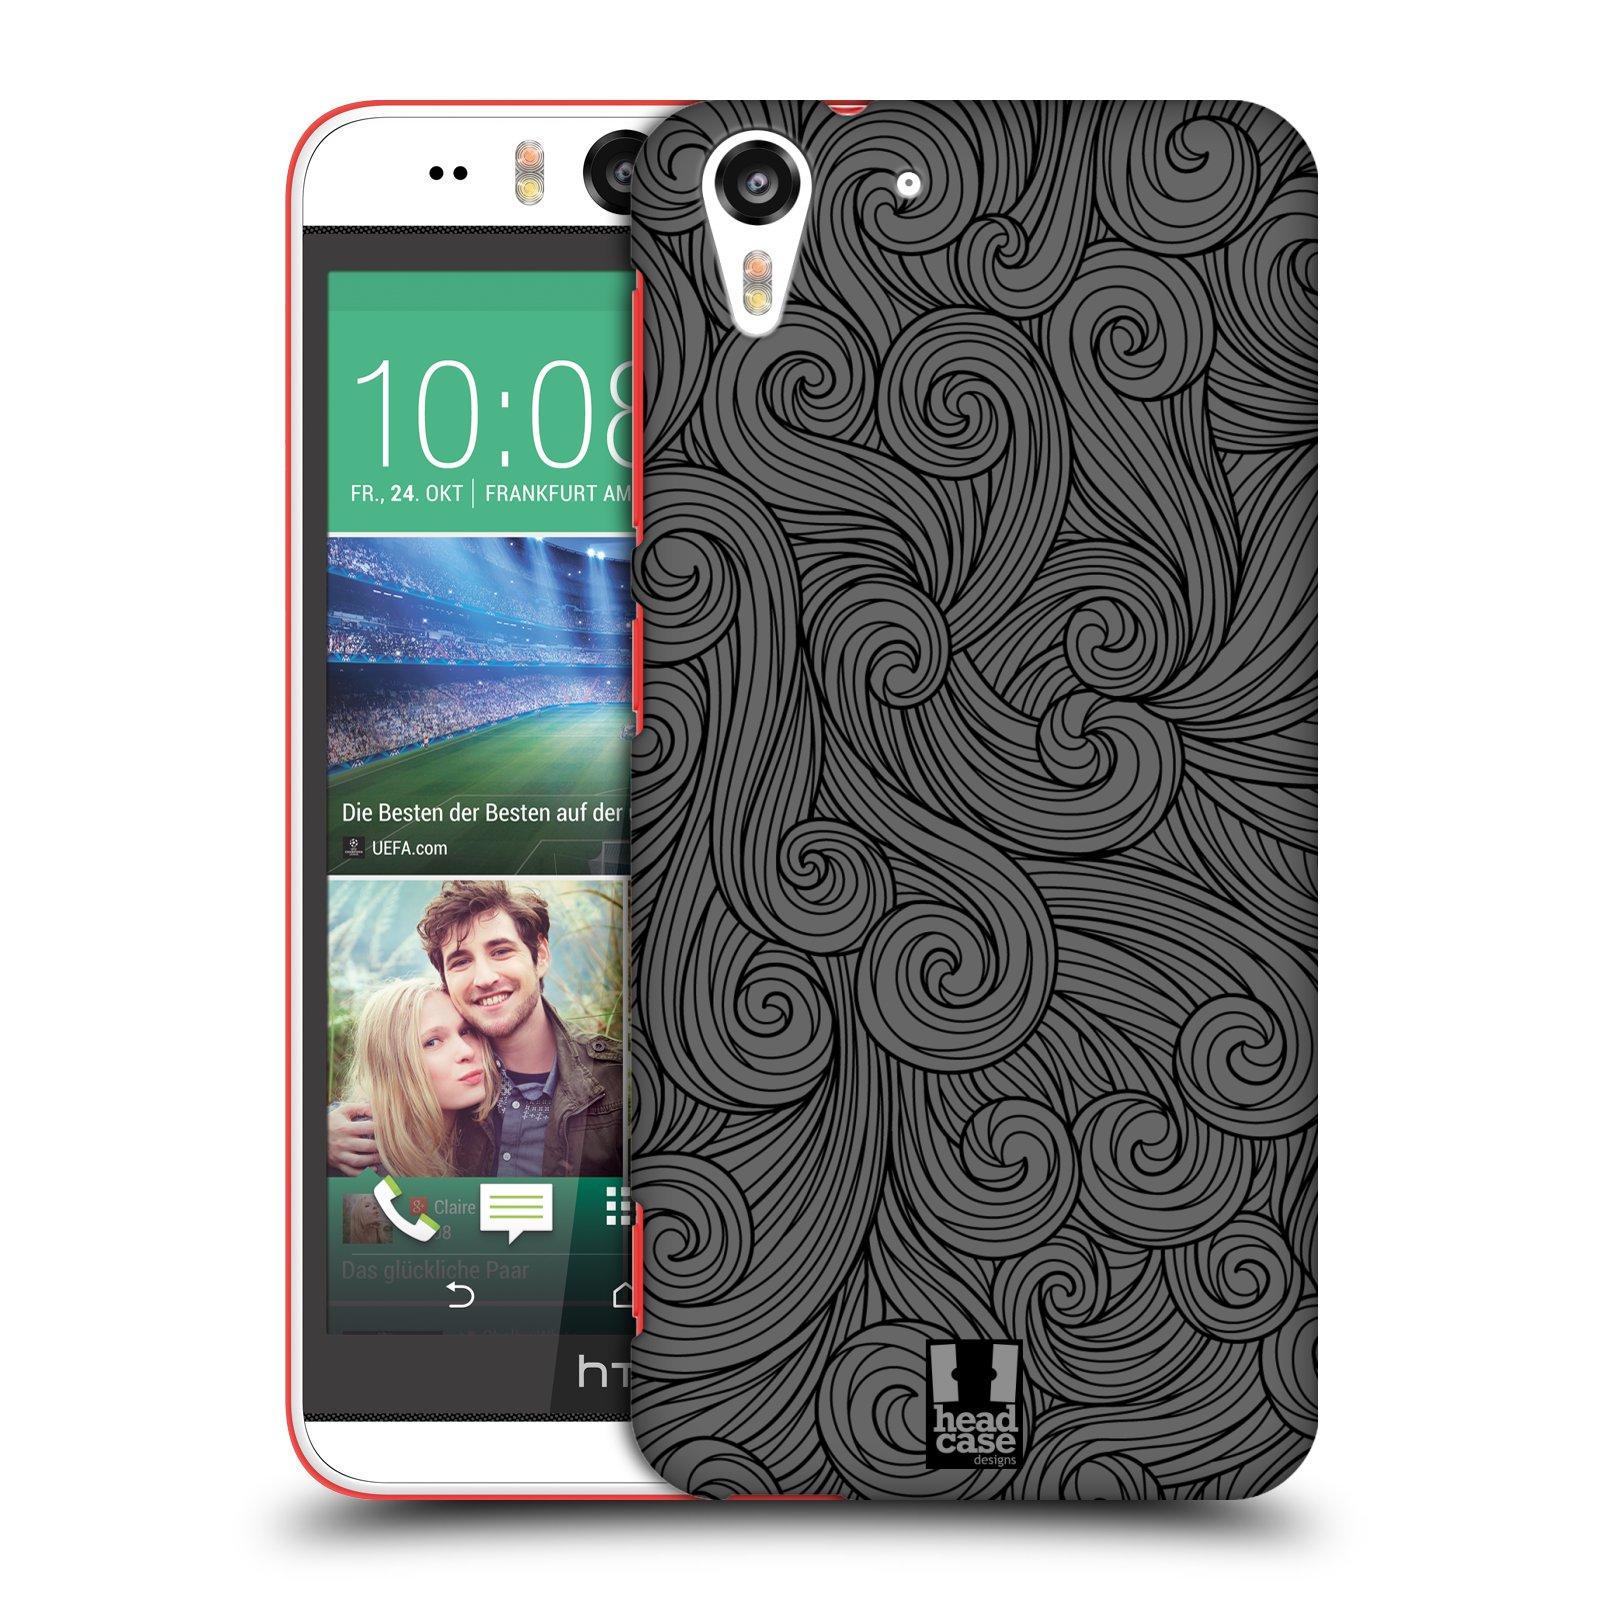 Plastové pouzdro na mobil HTC Desire EYE HEAD CASE Dark Grey Swirls (Kryt či obal na mobilní telefon HTC Desire EYE)